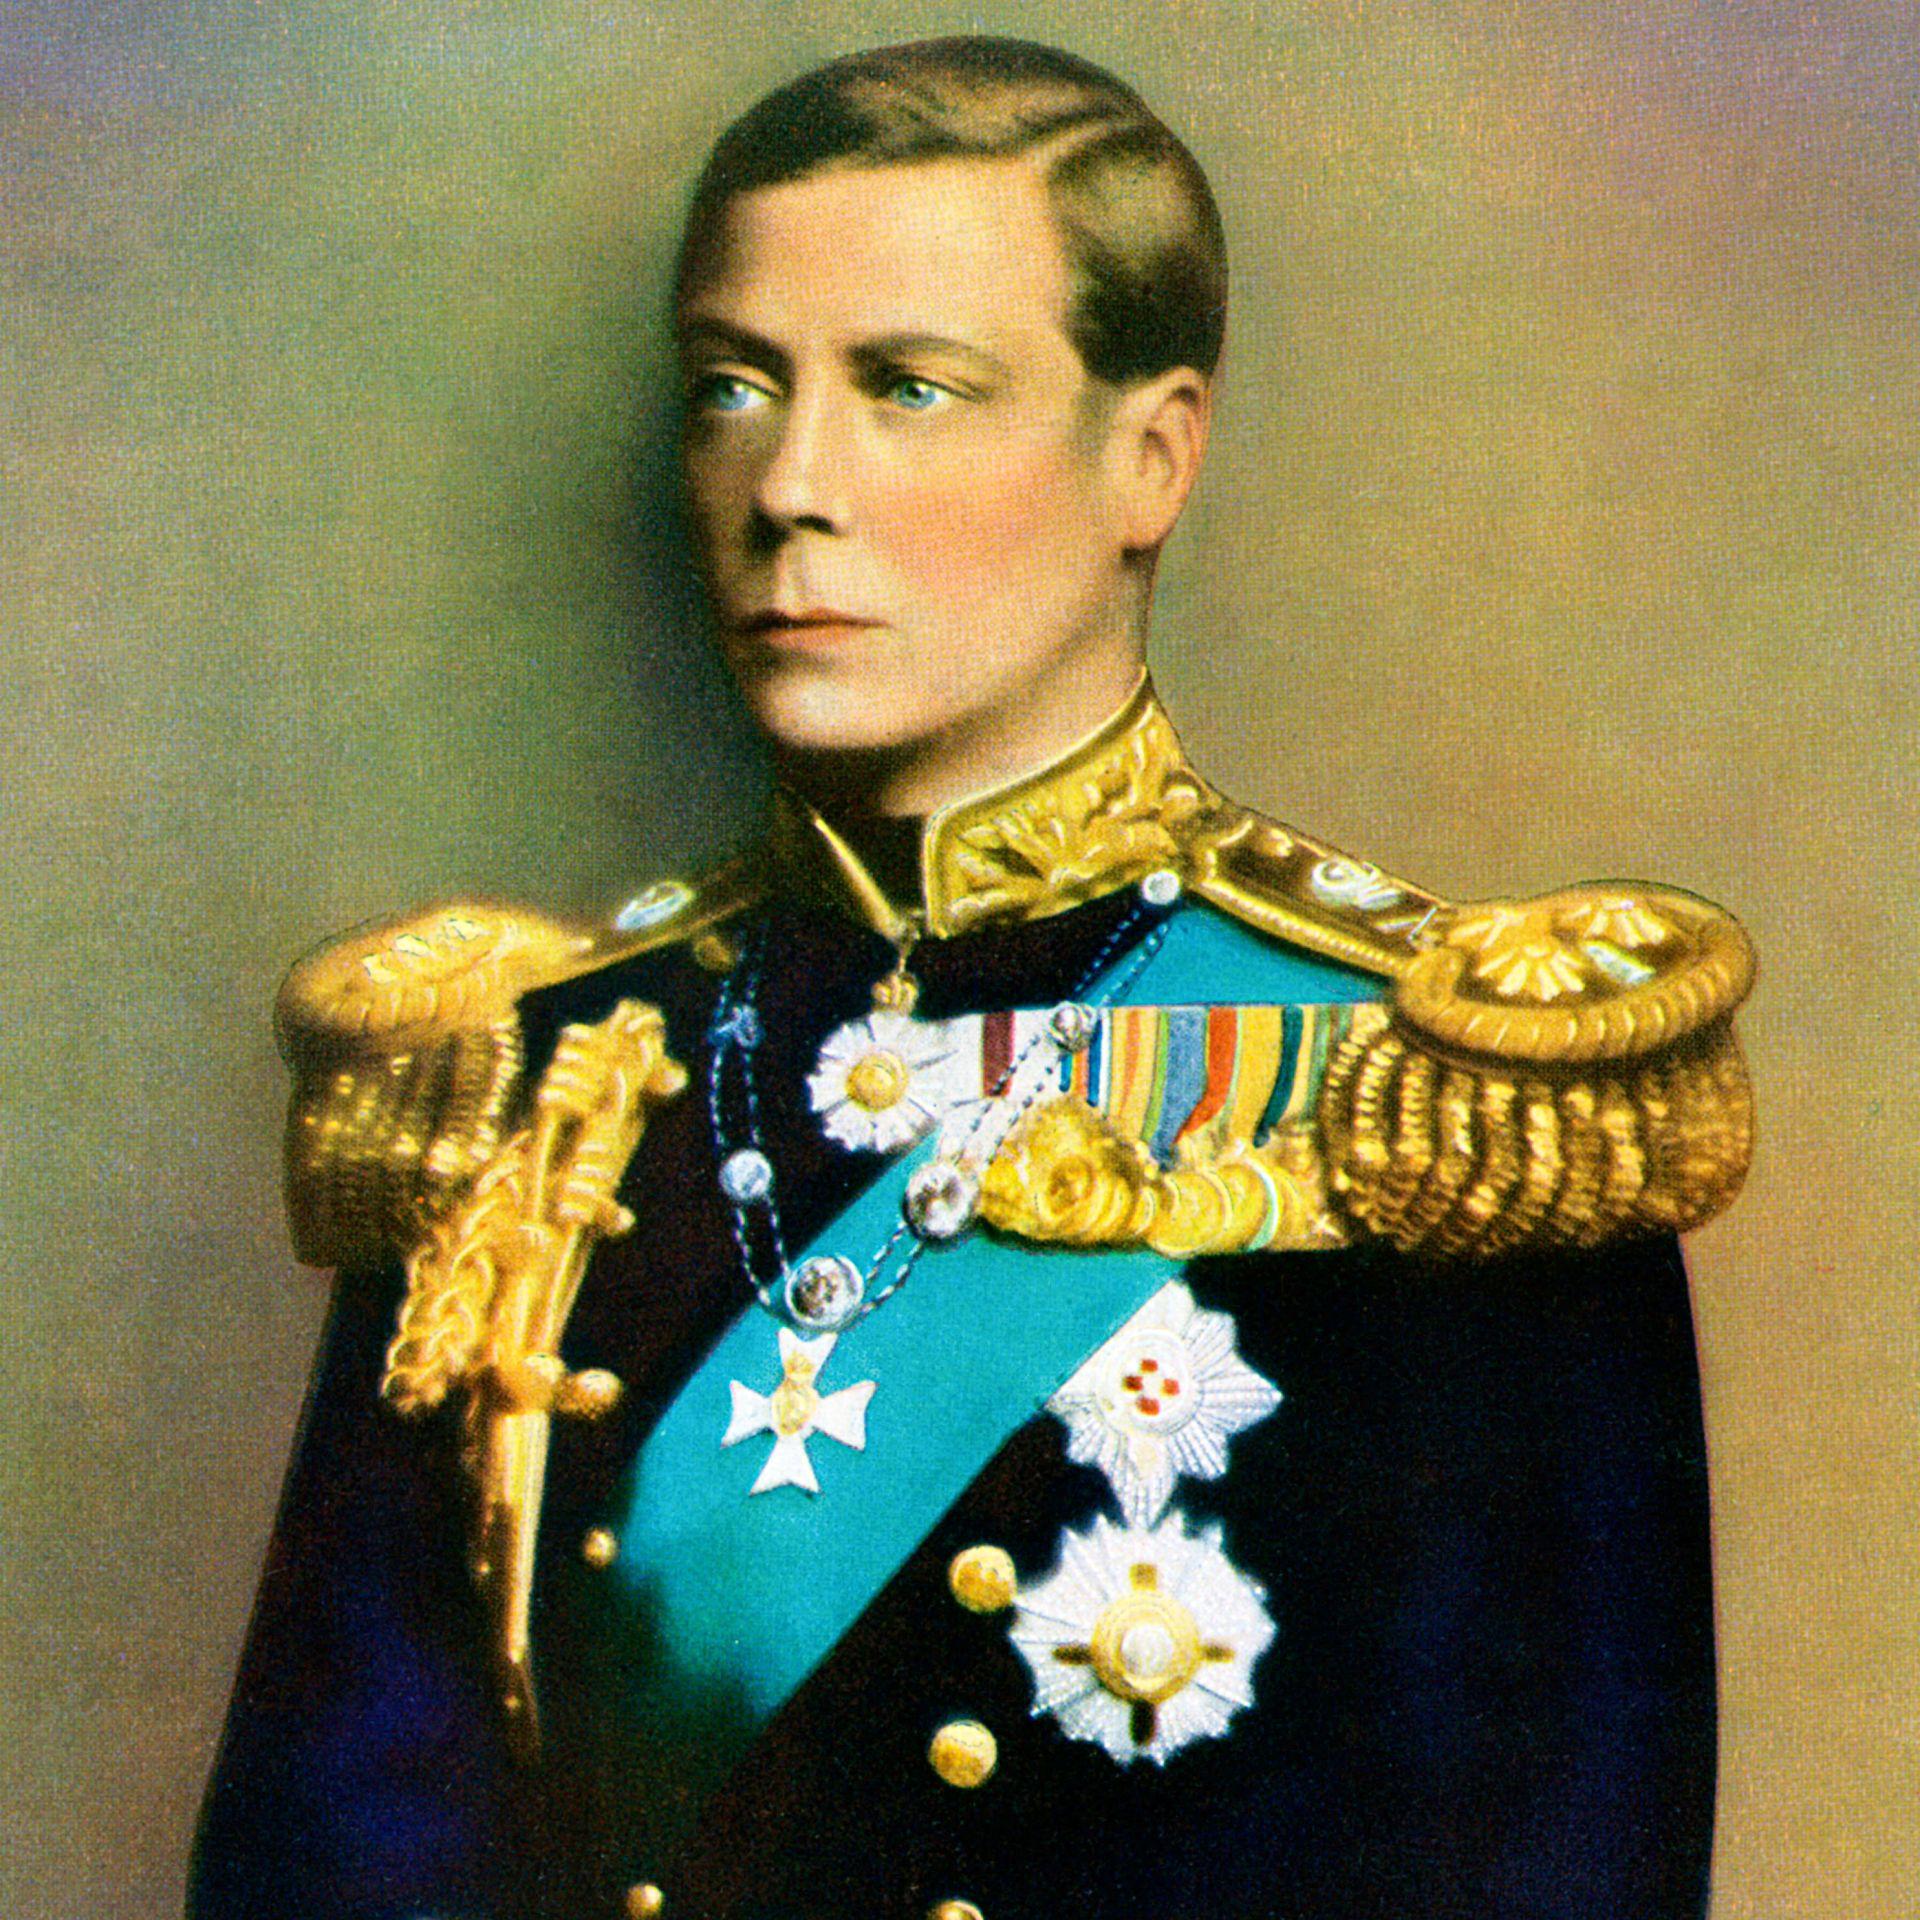 King Edward VIII, 1894-1972